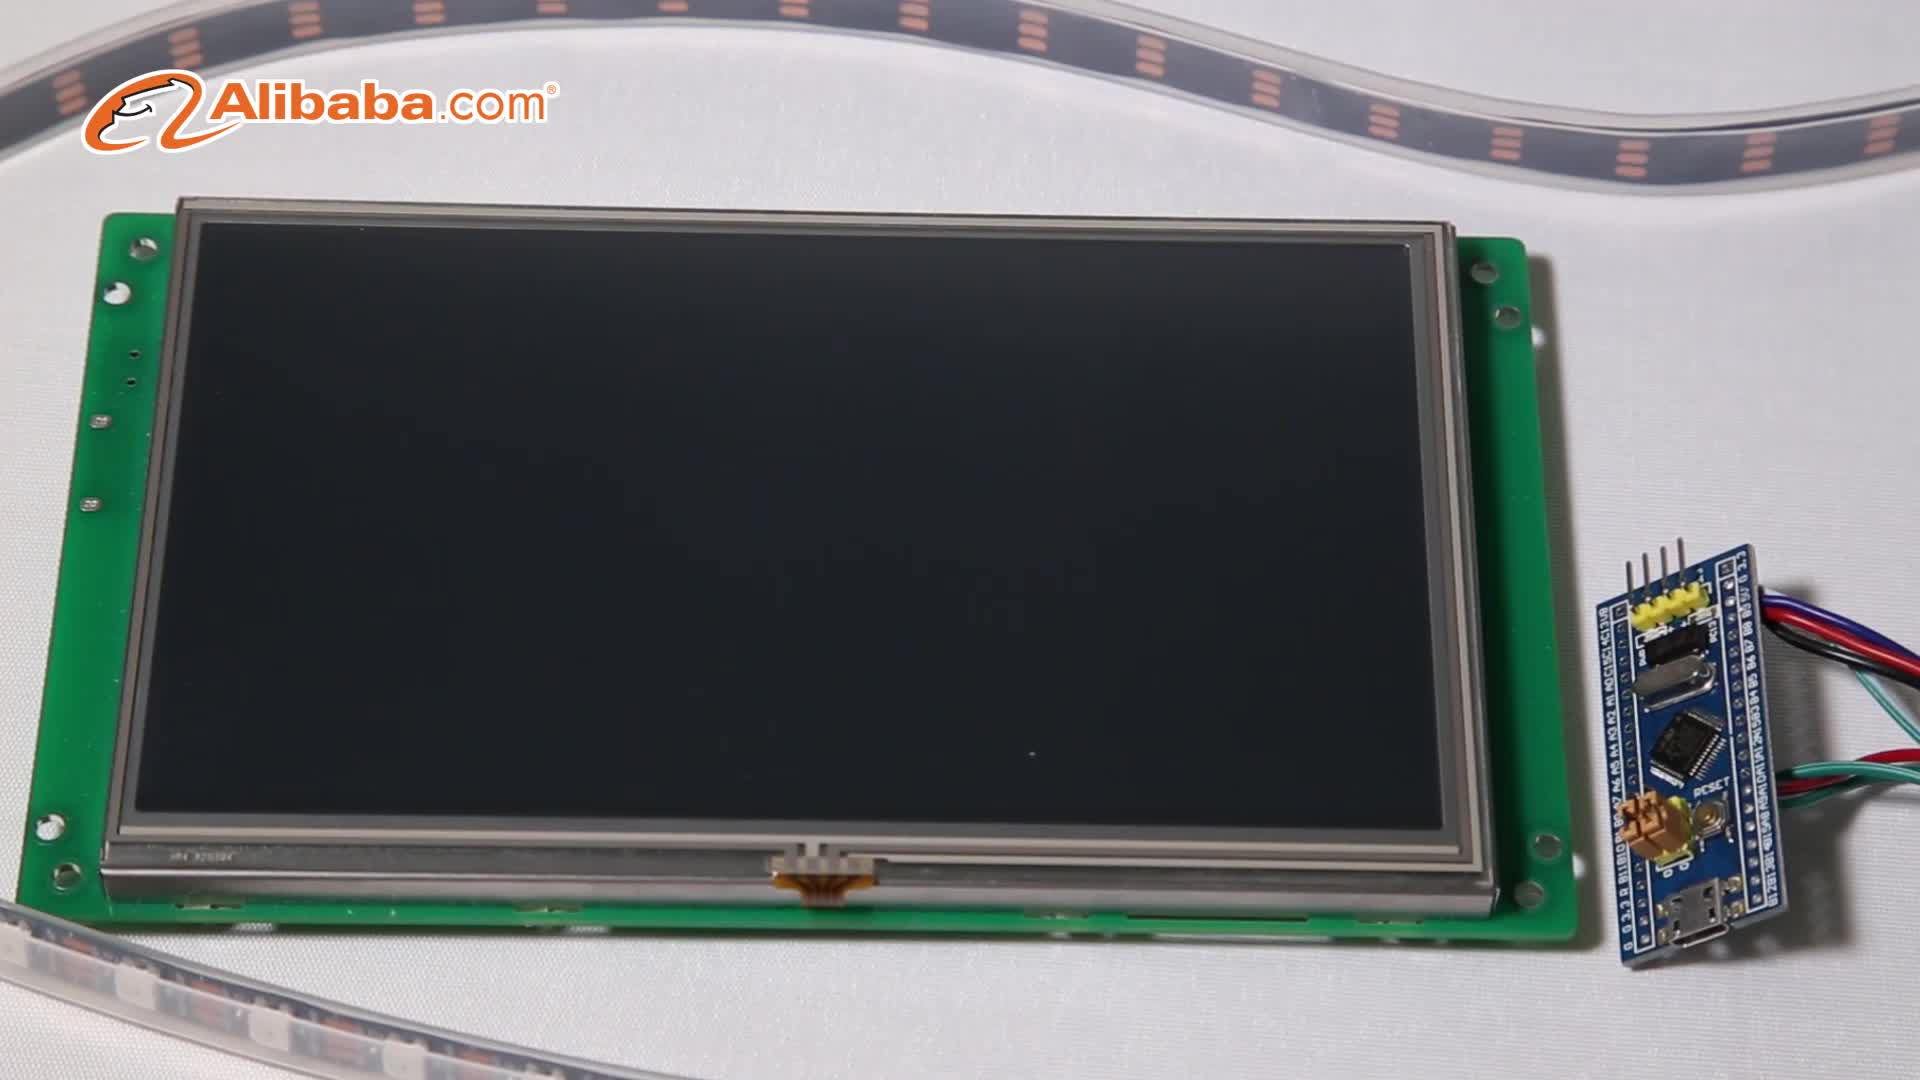 STONE 3.5 Inch High Resolution (320x480) TFT LCD Screen Module